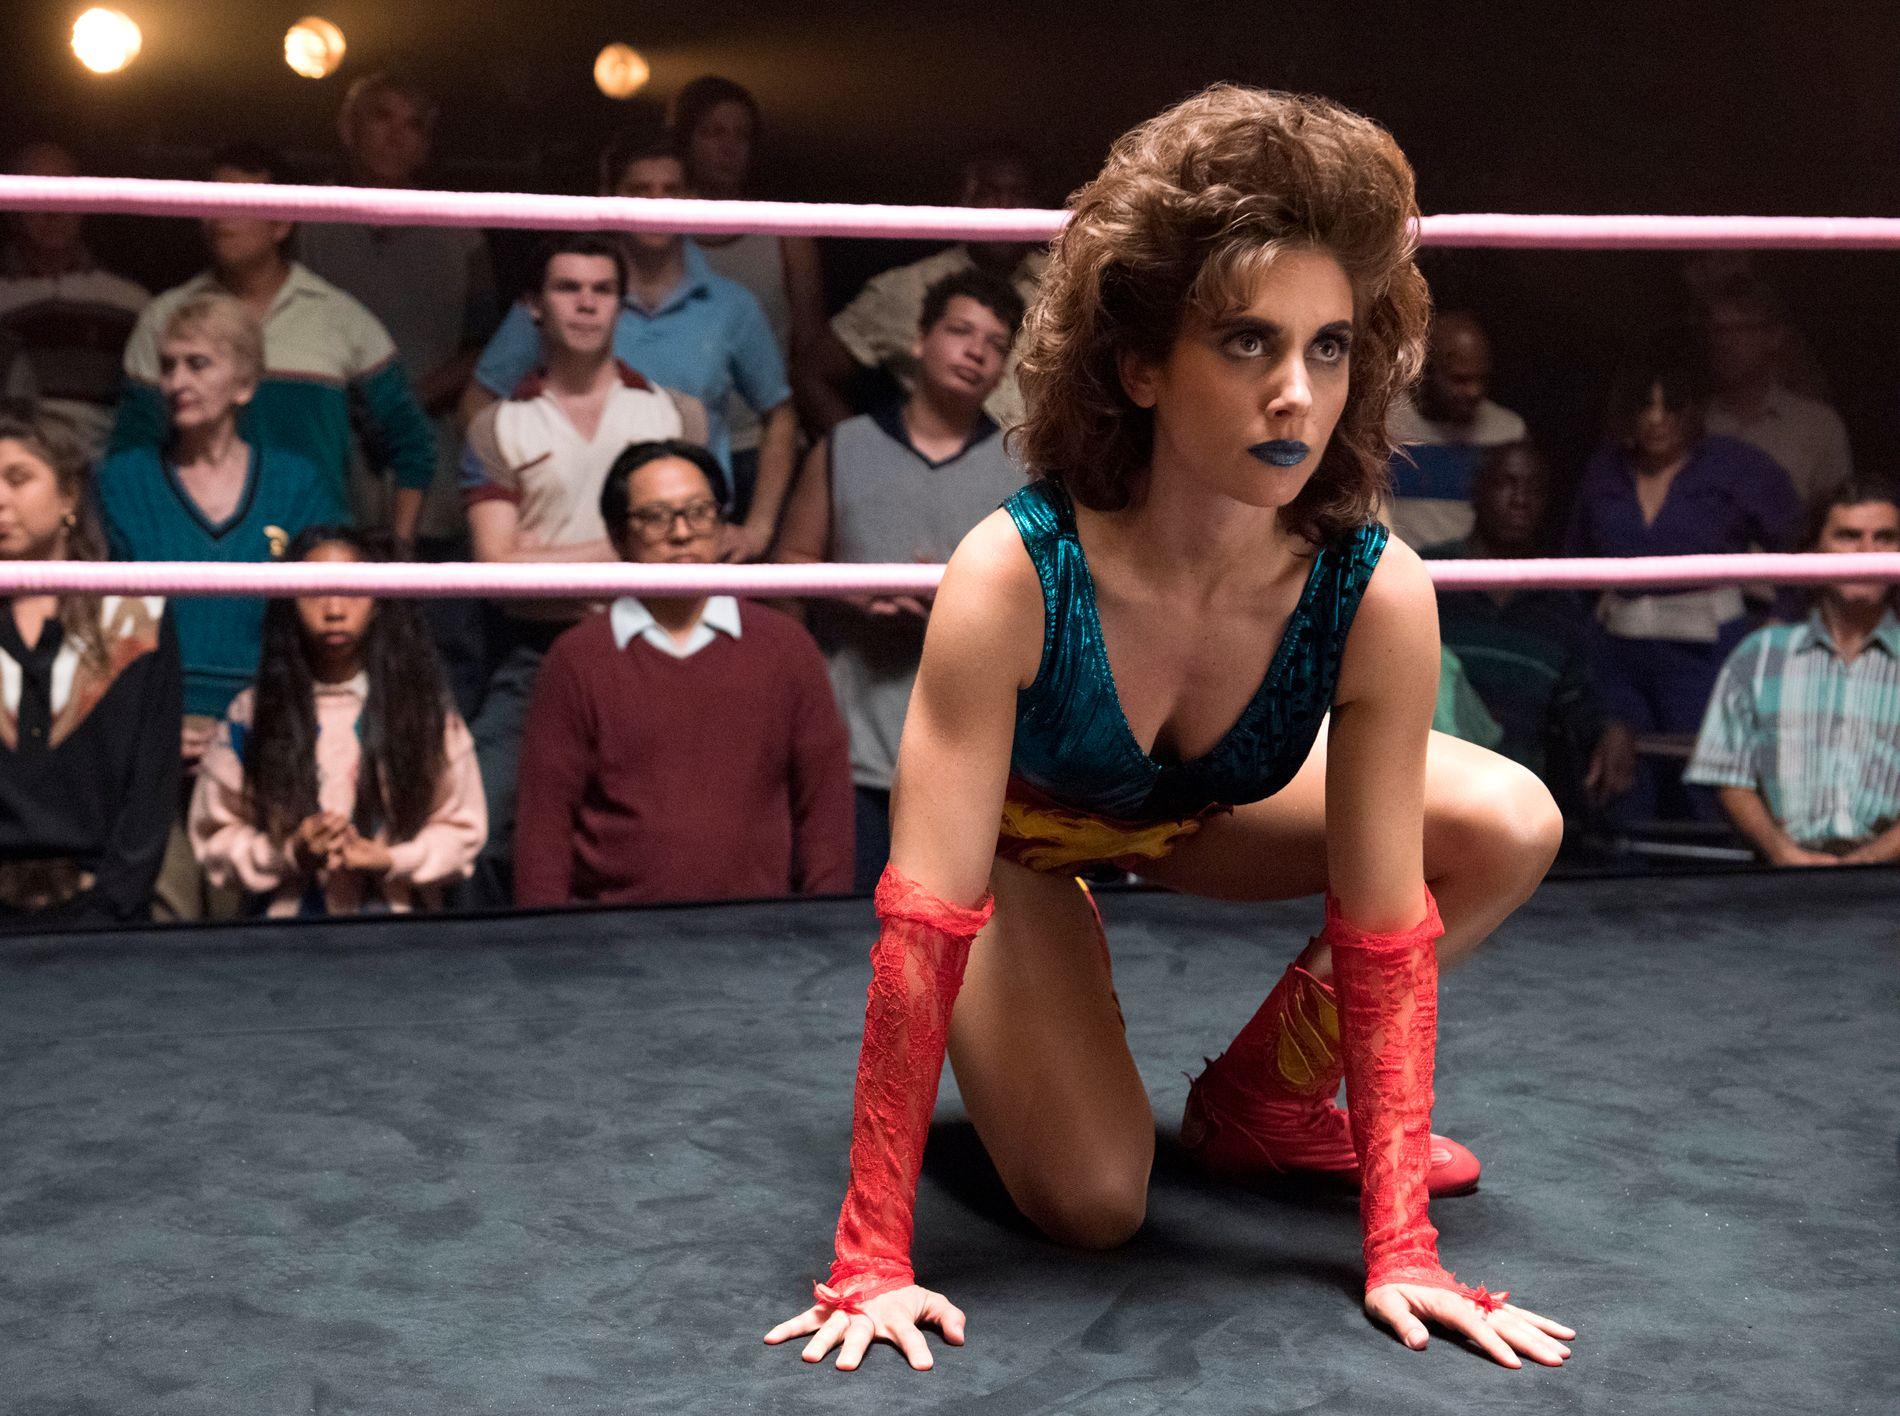 KOMISK OG KYNISK: Alison Brie som Ruth i «Glow». Brie er Golden Globe-nominert for rollen.